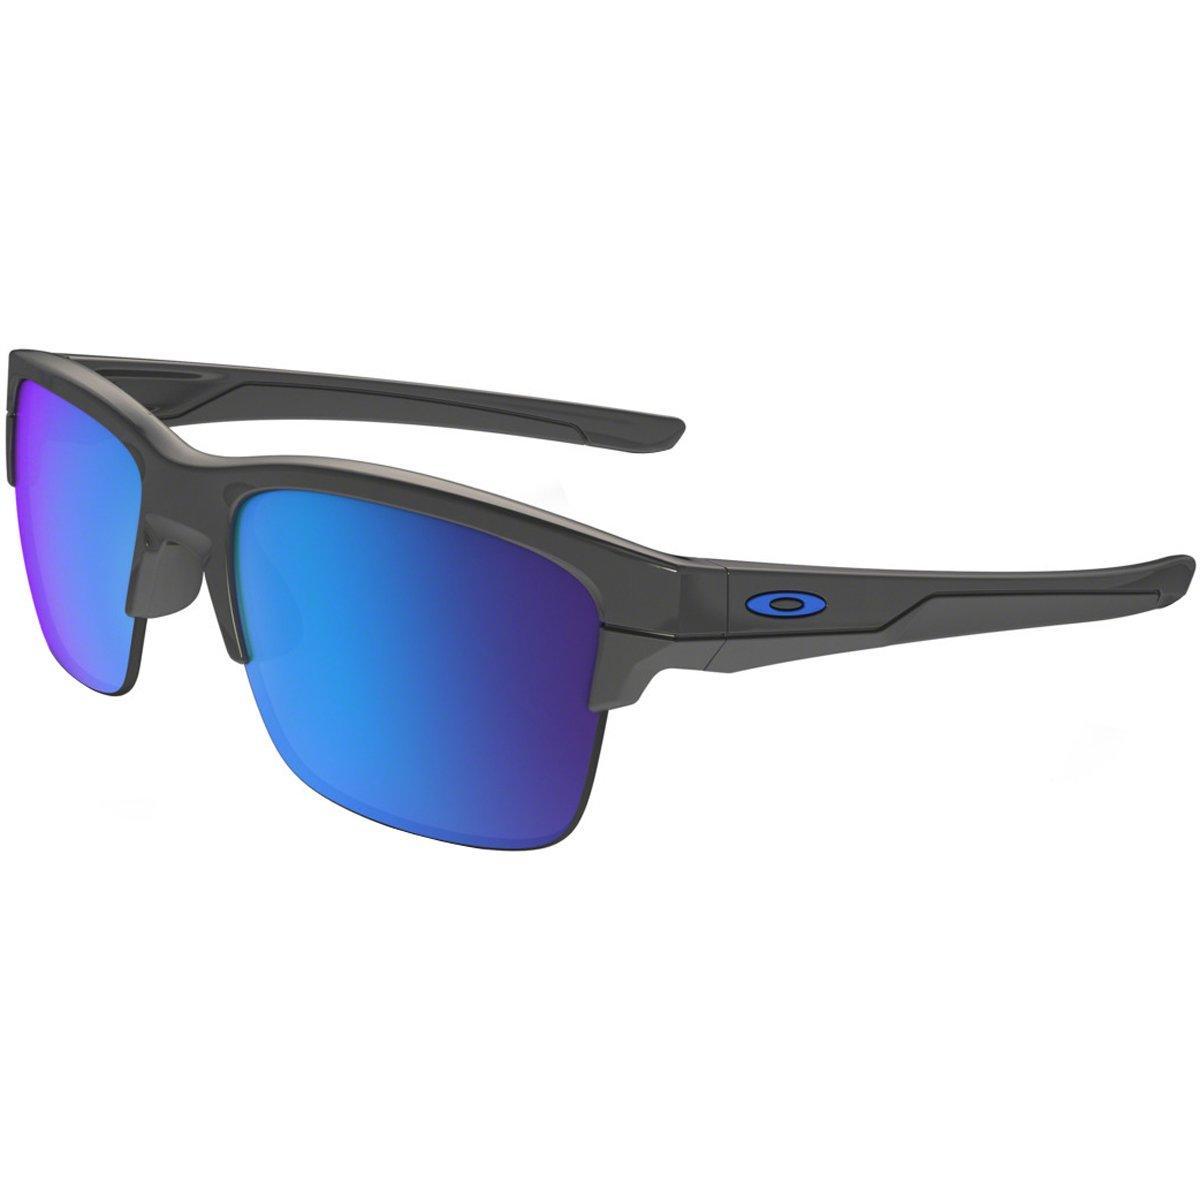 Oakley Men's OO9316 Thinlink Rectangular Sunglasses, Dark Grey/Sapphire Iridium, 63 mm by Oakley